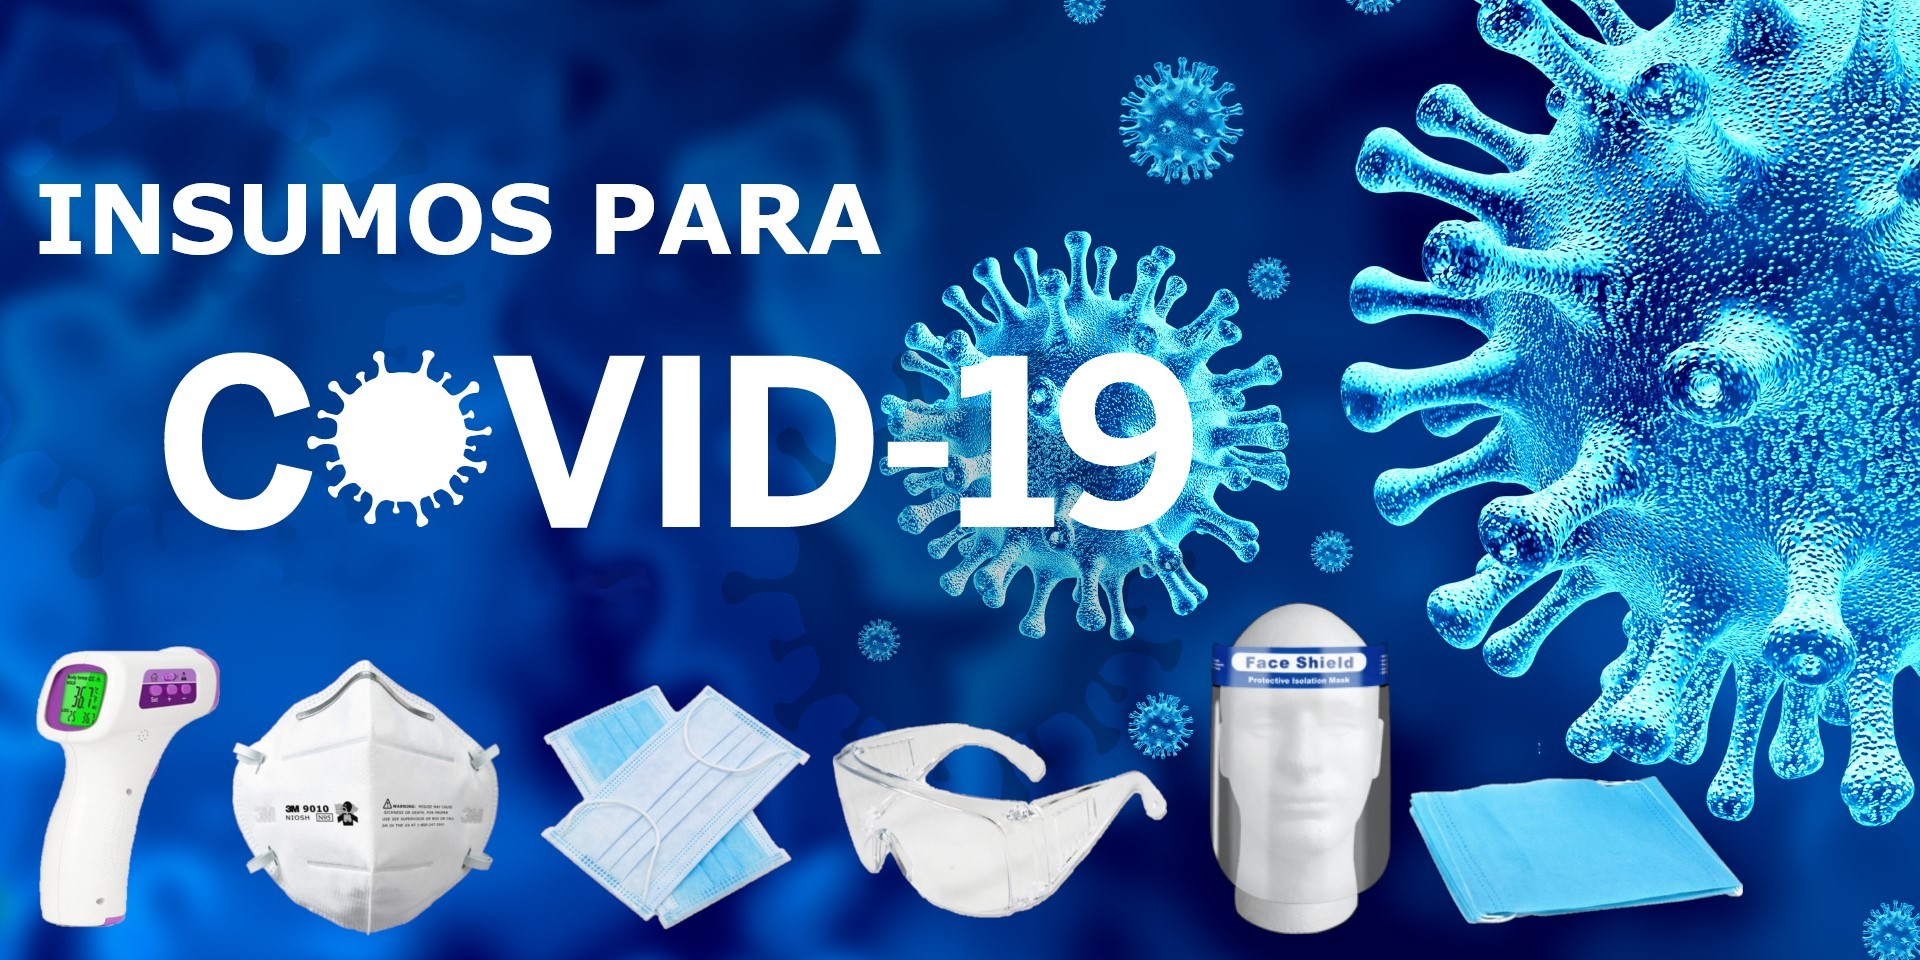 insumosparacovid19, covid19, covid-19